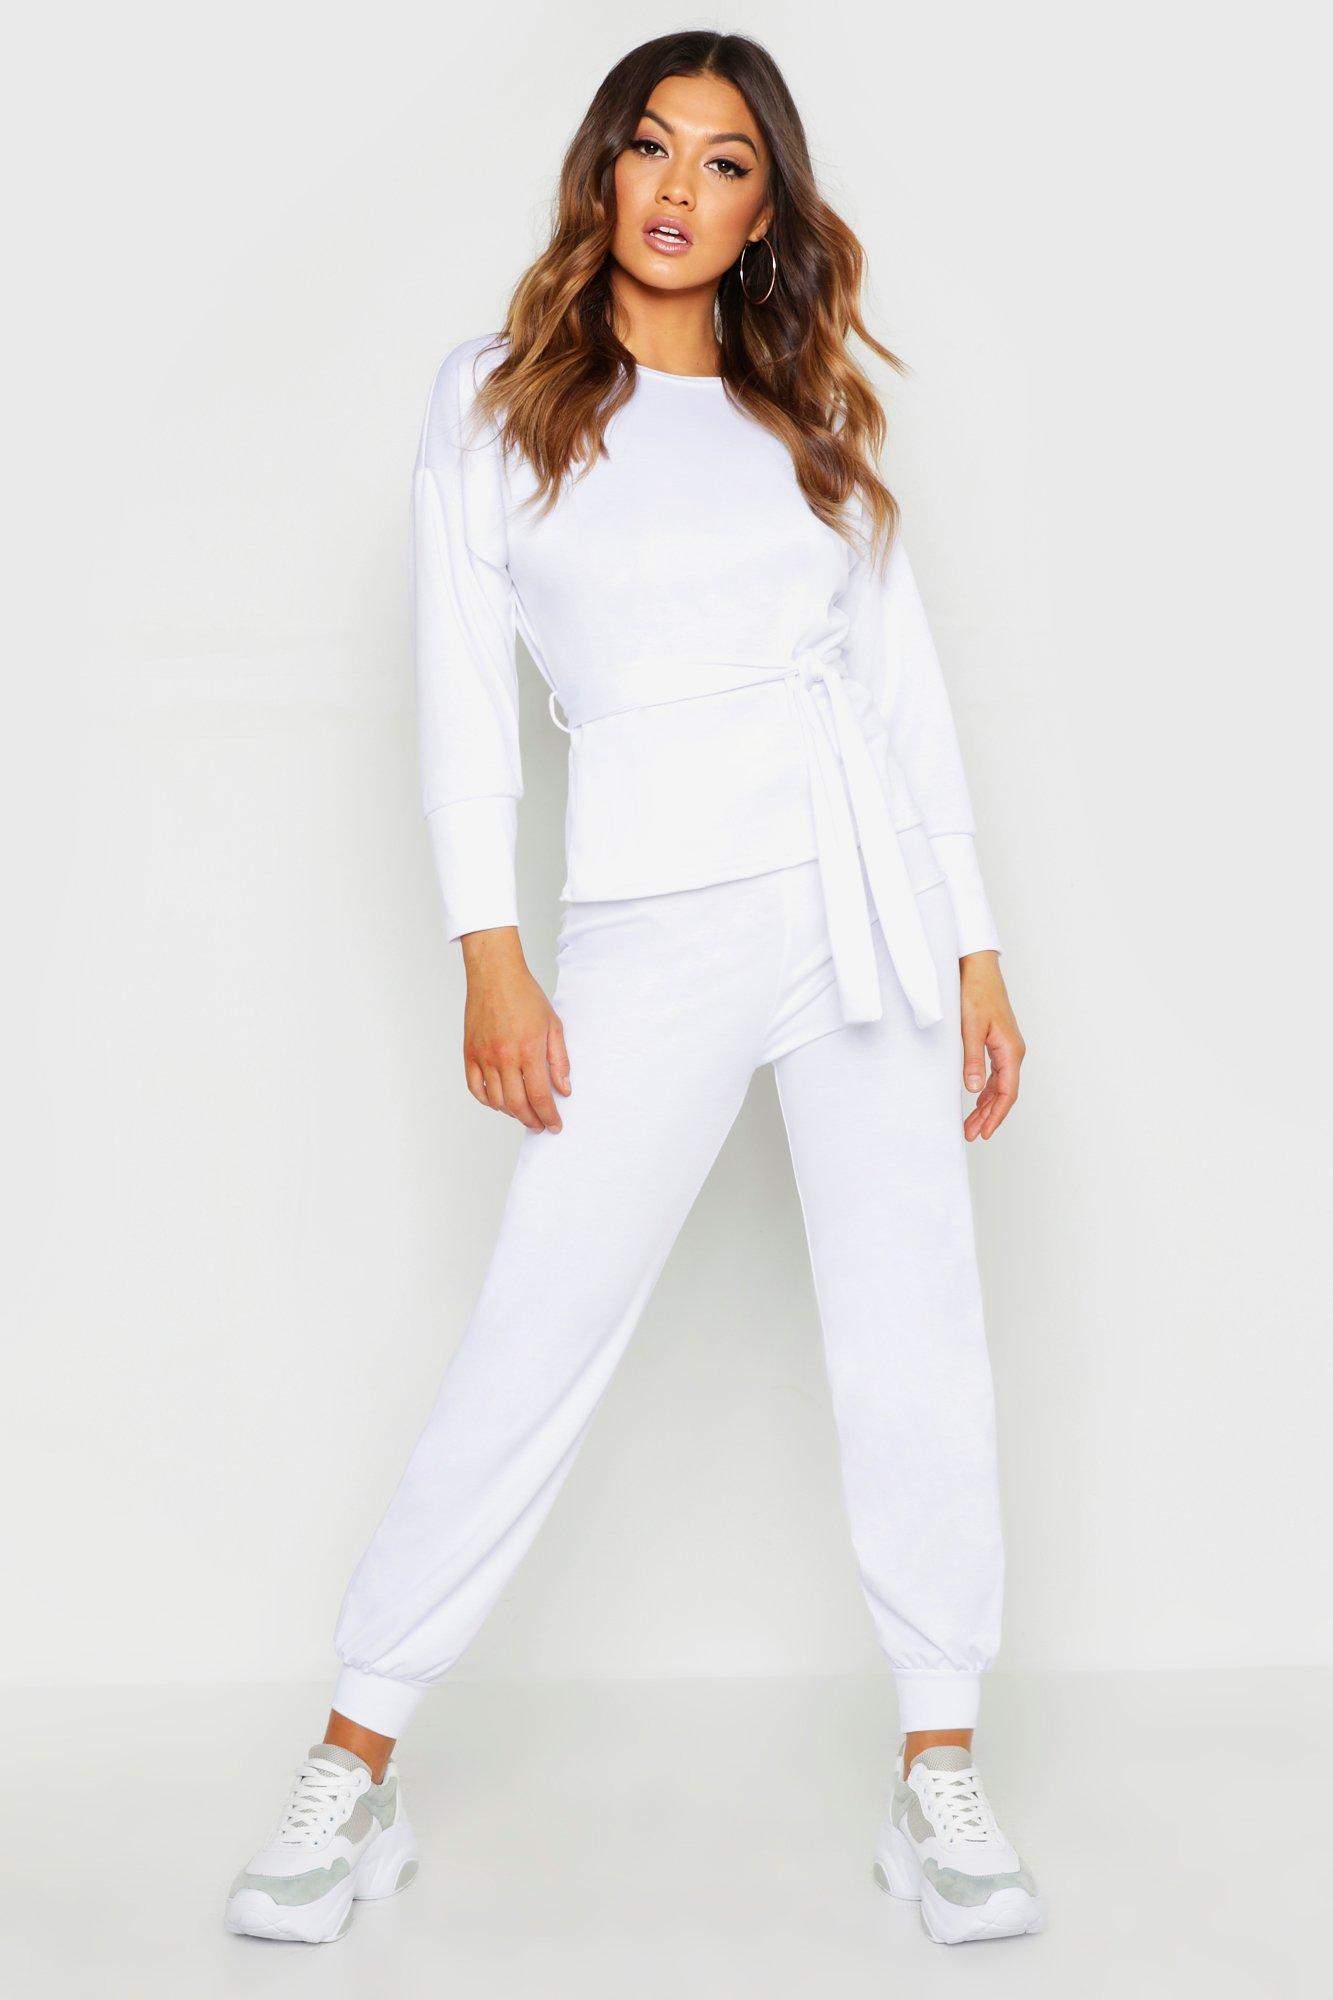 Womens Trainingsanzug mit Sweatshirt & Jogginghose mit Gürtel - white - M/L, White - Boohoo.com